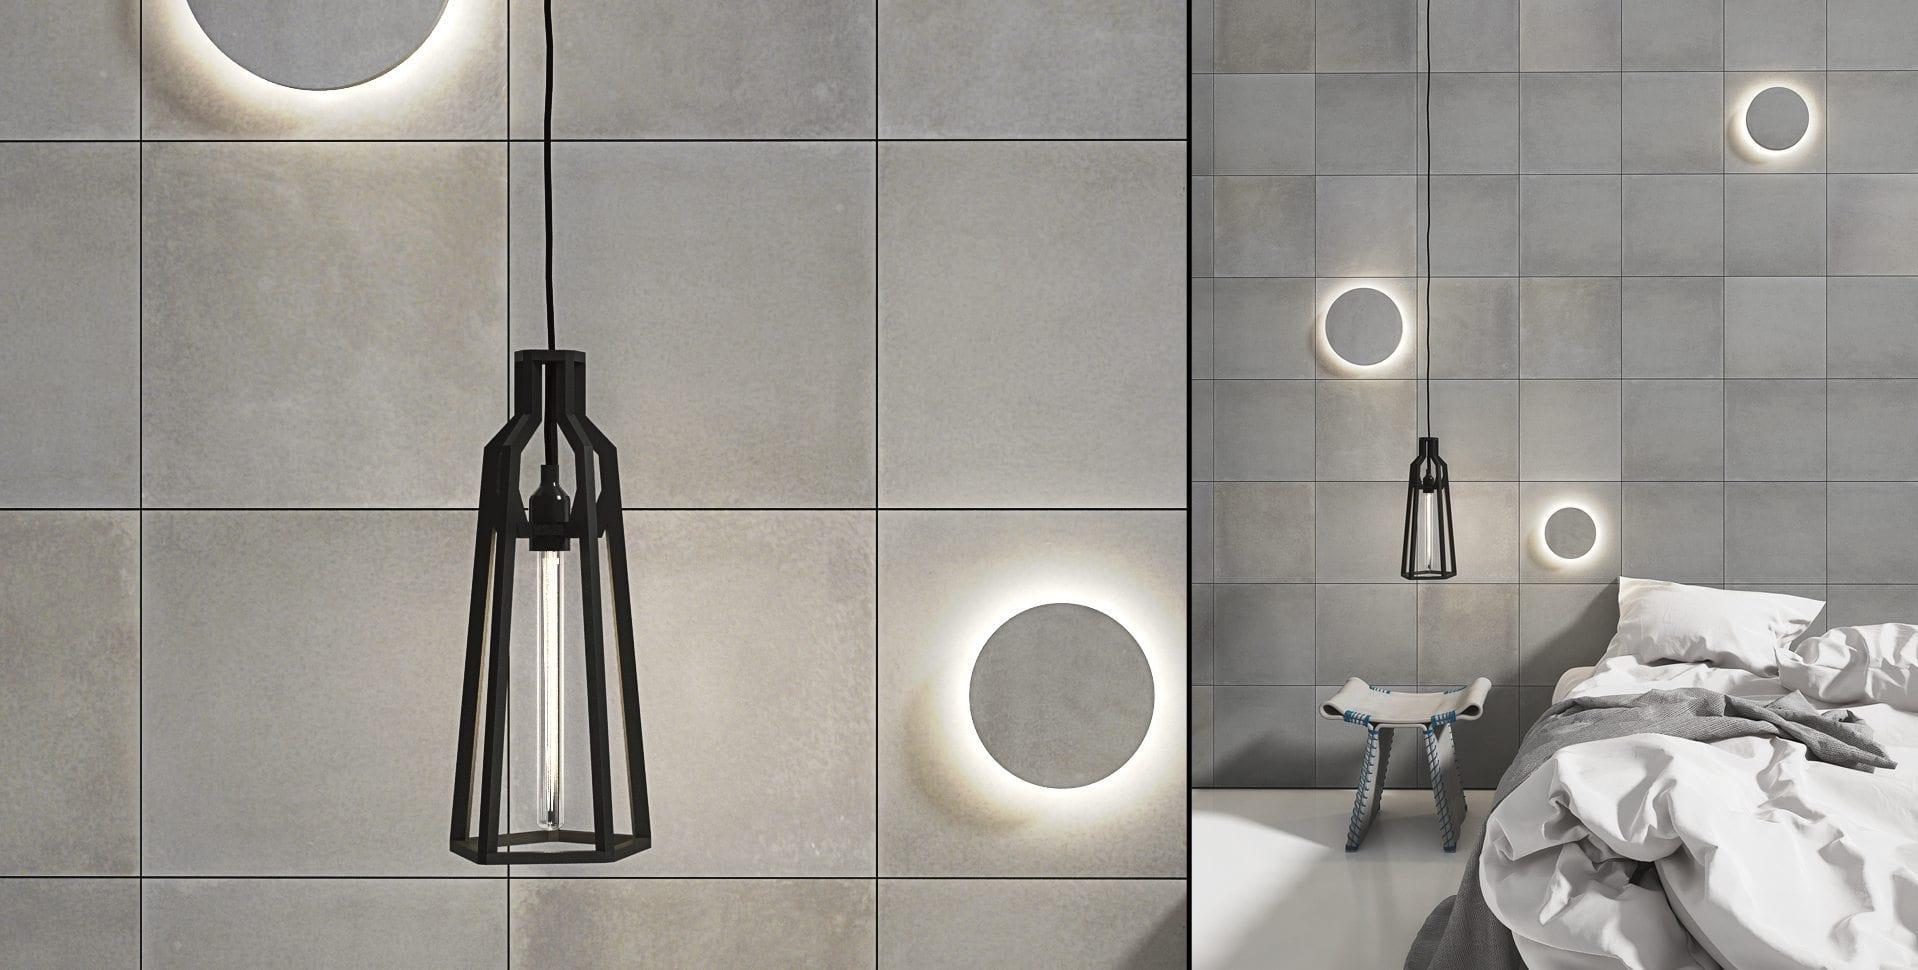 Maayan-Golan_Architectural-Visualization_product-visualization_wall-tiles_lighting-fixture_itai-bar-on_bedroom_10